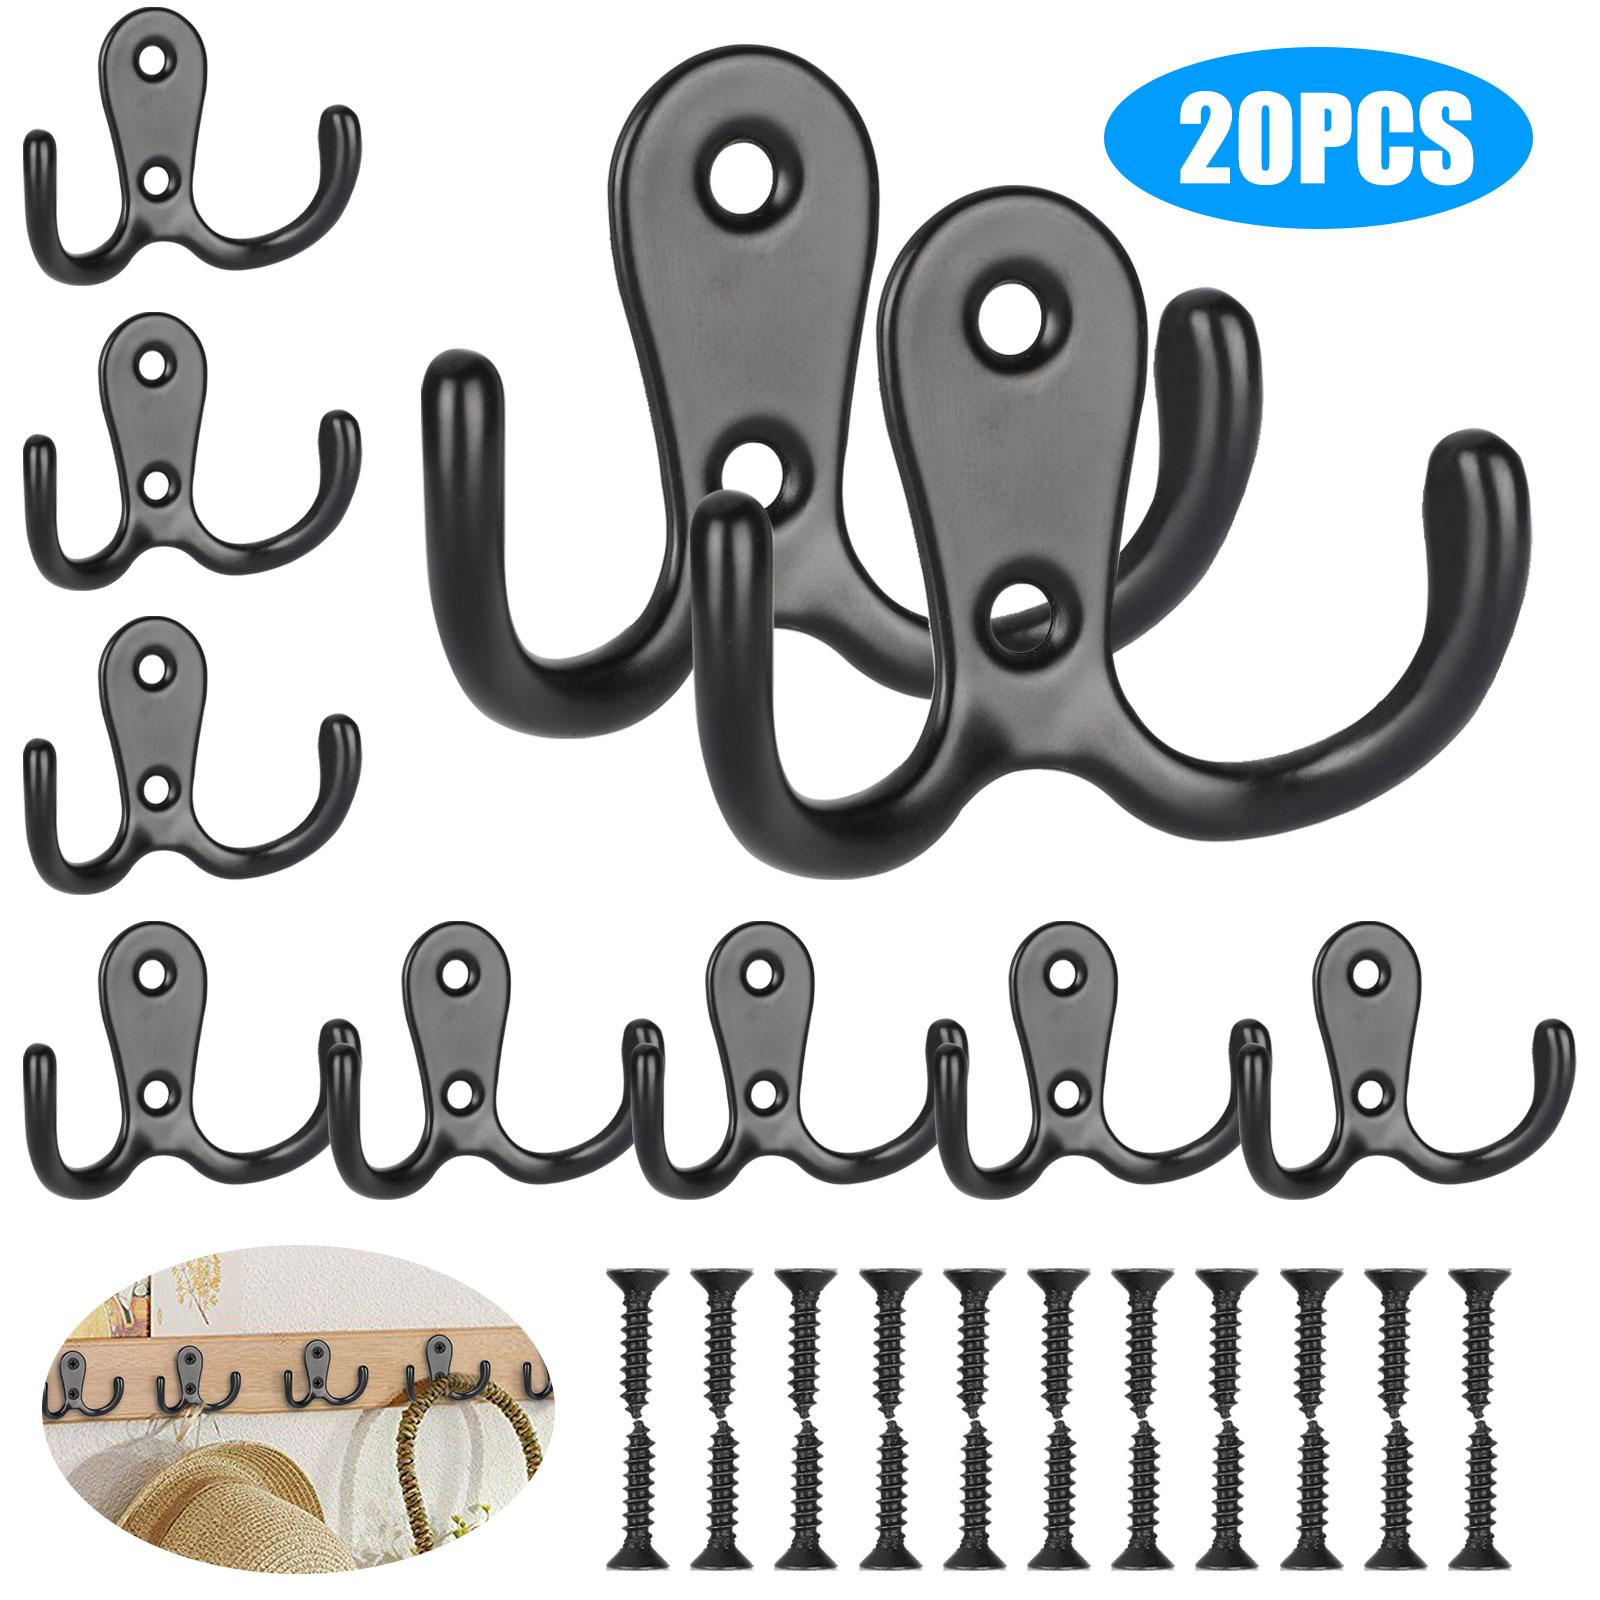 20Pcs Bathroom Door Wall Mounted Single Metal Hooks Coat Hangers W// 40Pcs Screws